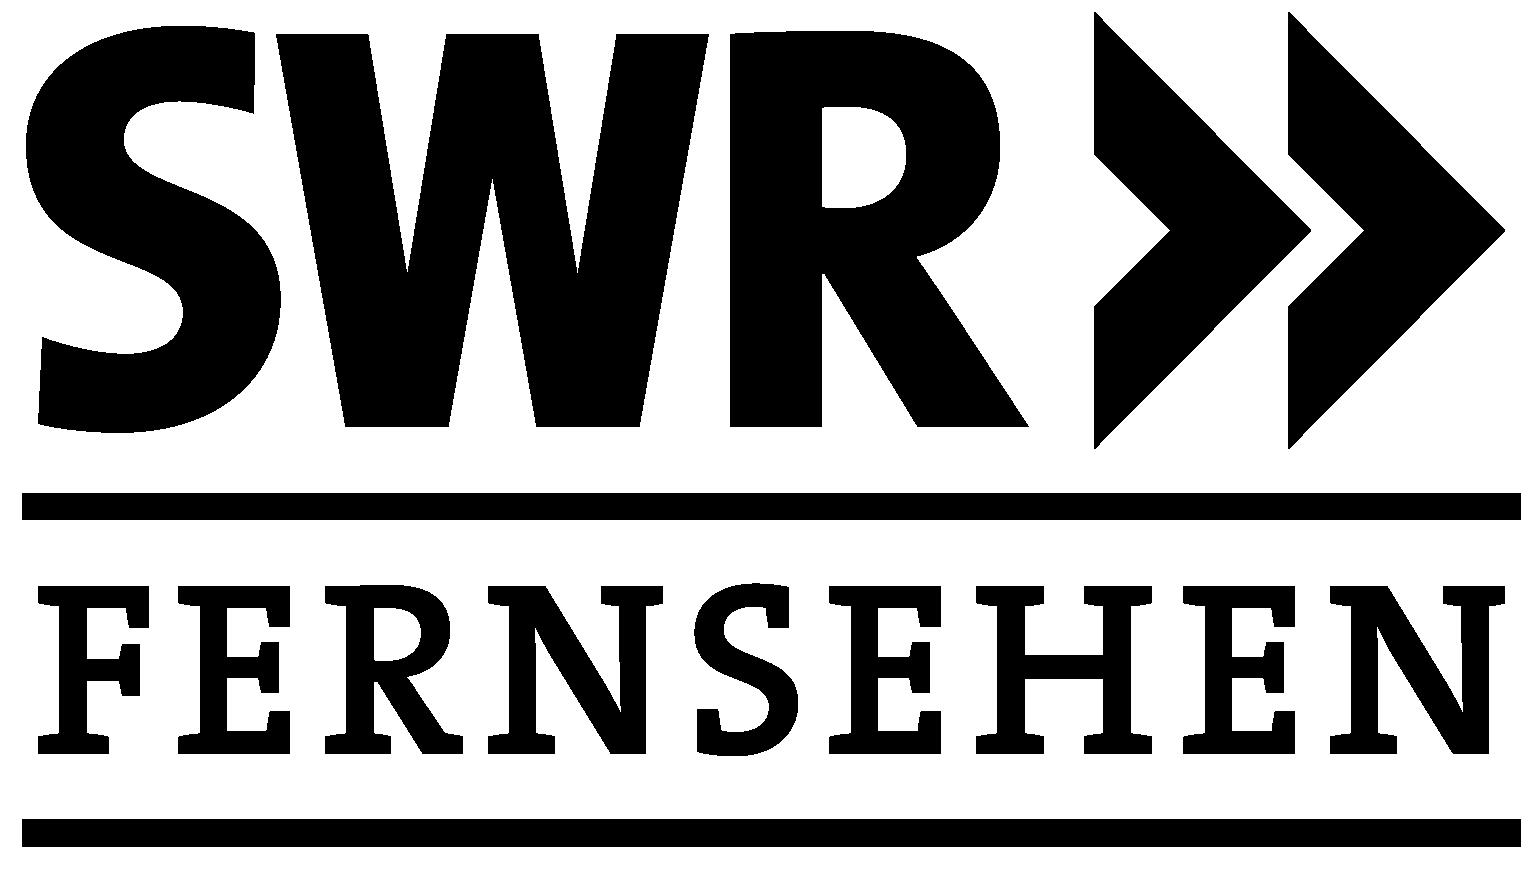 SWR Fernsehen Logo